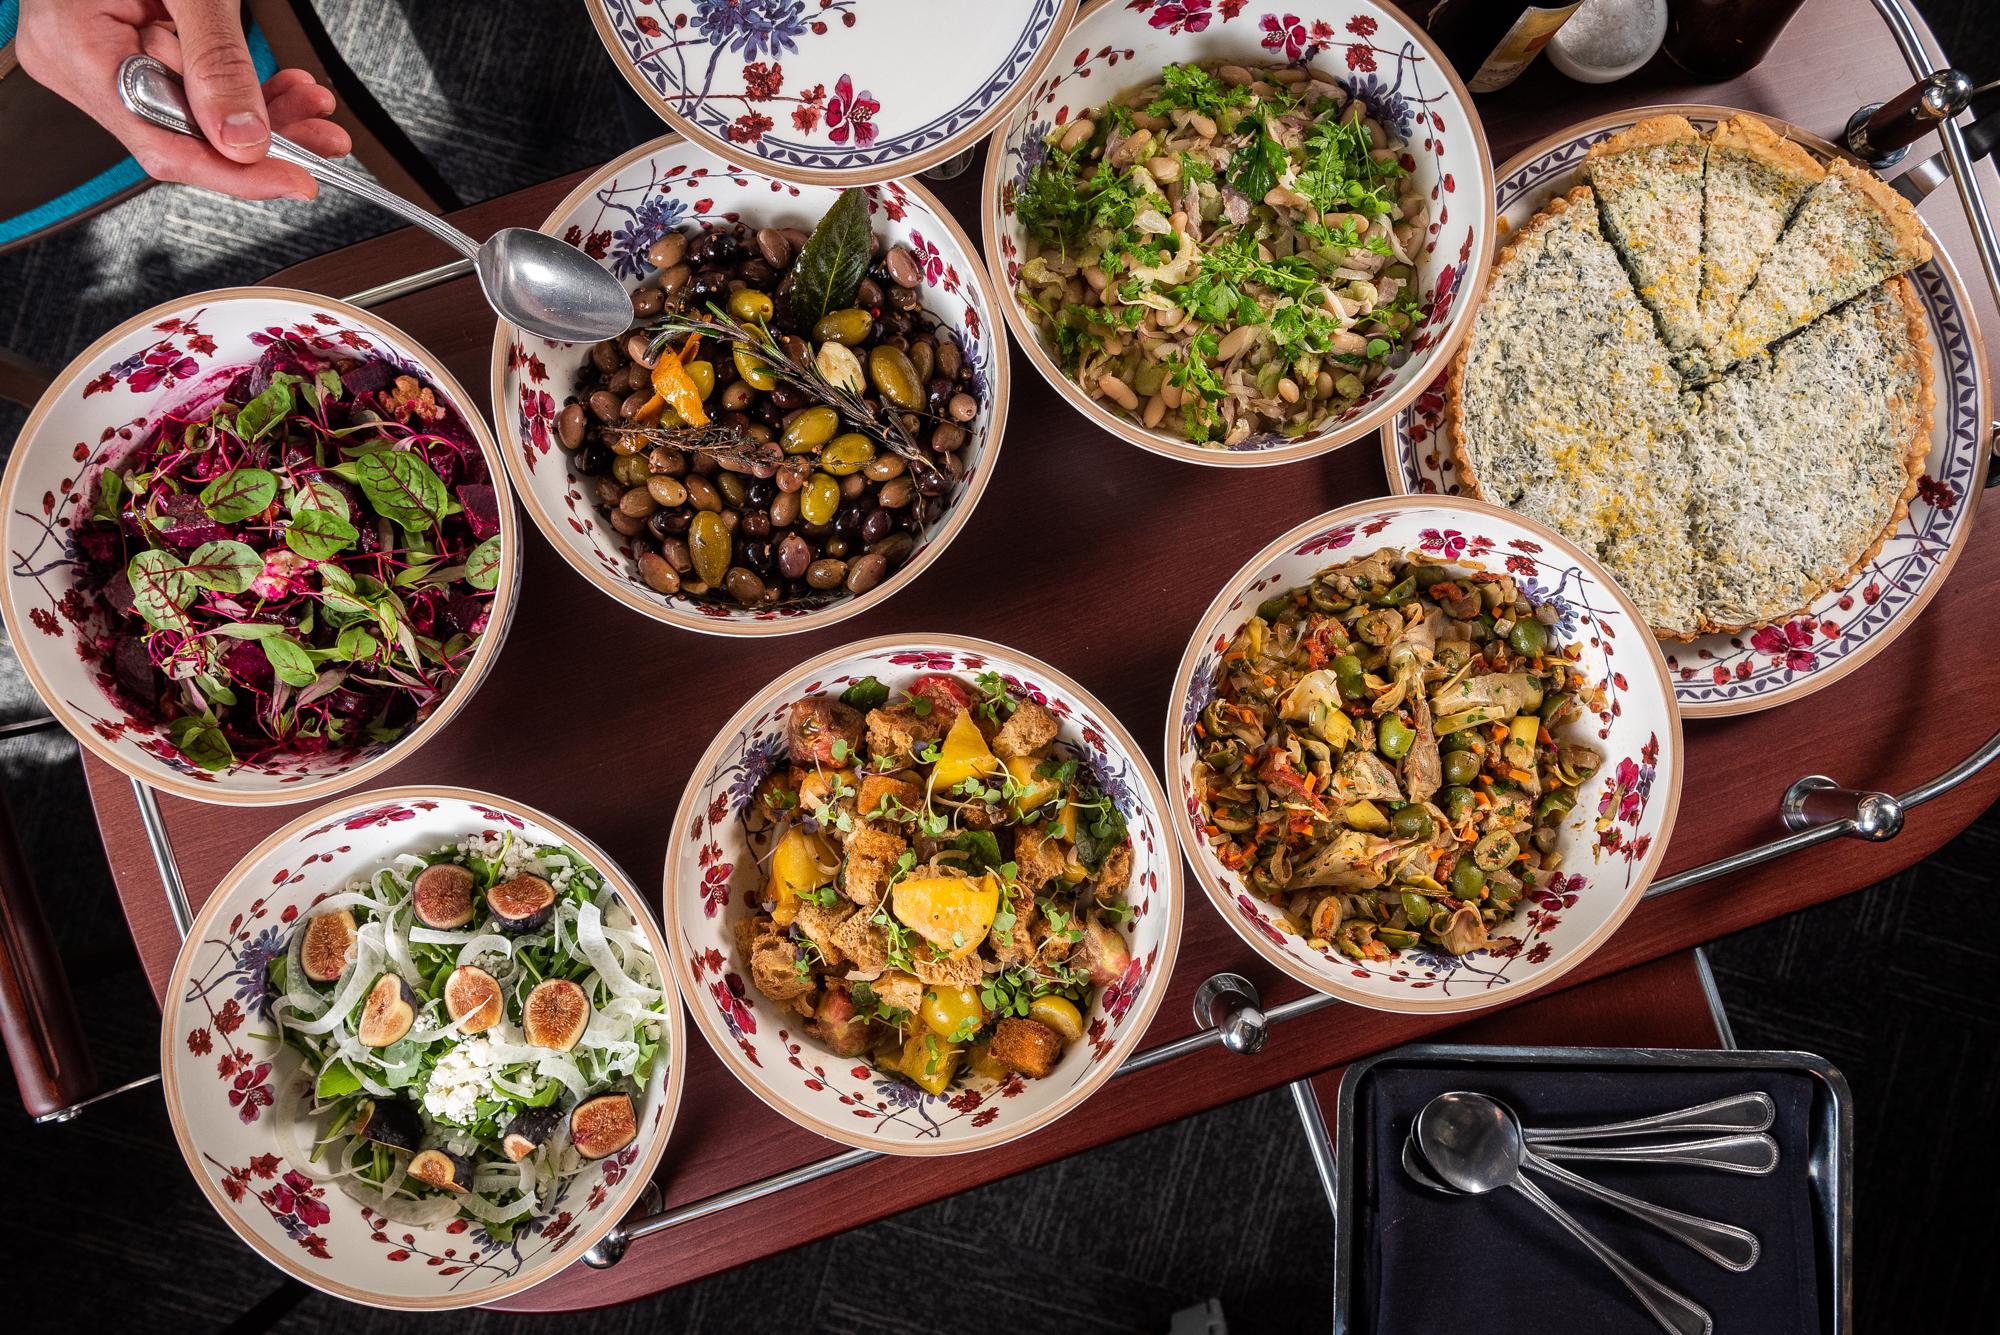 Ashok Bajaj's New Restaurant Downtown Takes Aim at Northern Italian Traditions